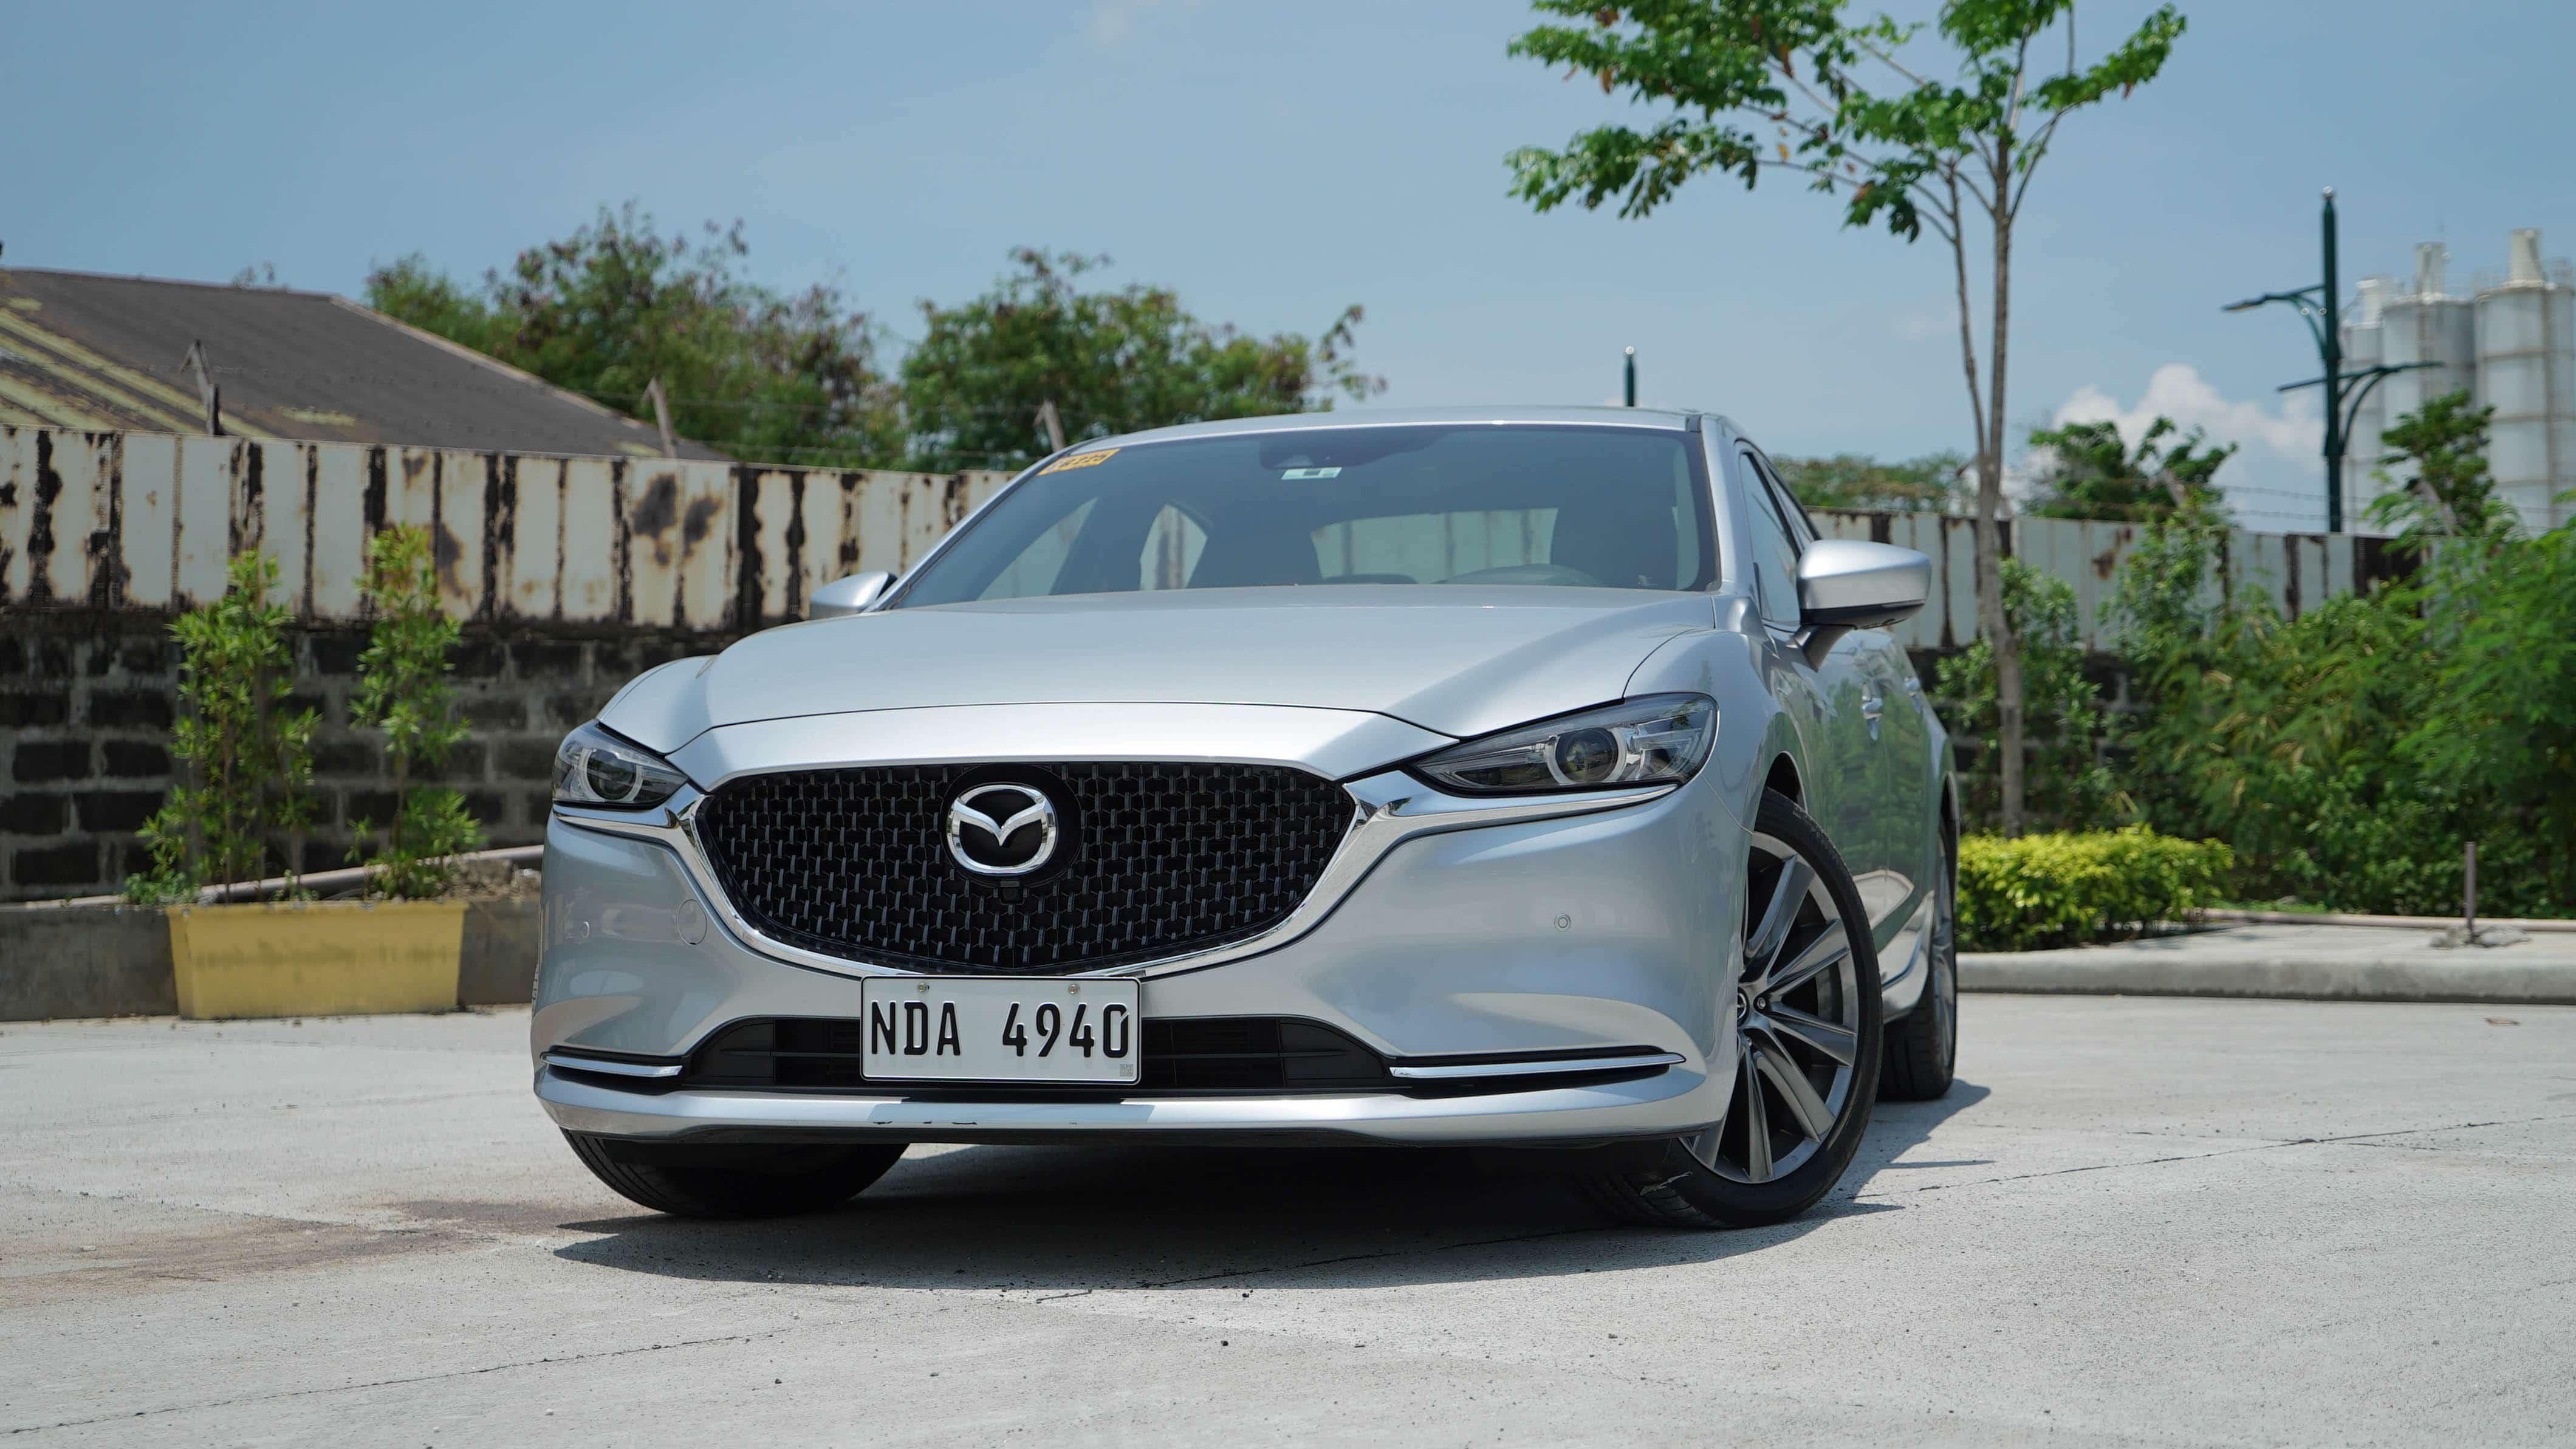 2019 Mazda 6 Not Your Ordinary Mid Size Sedan Gadgetmatch